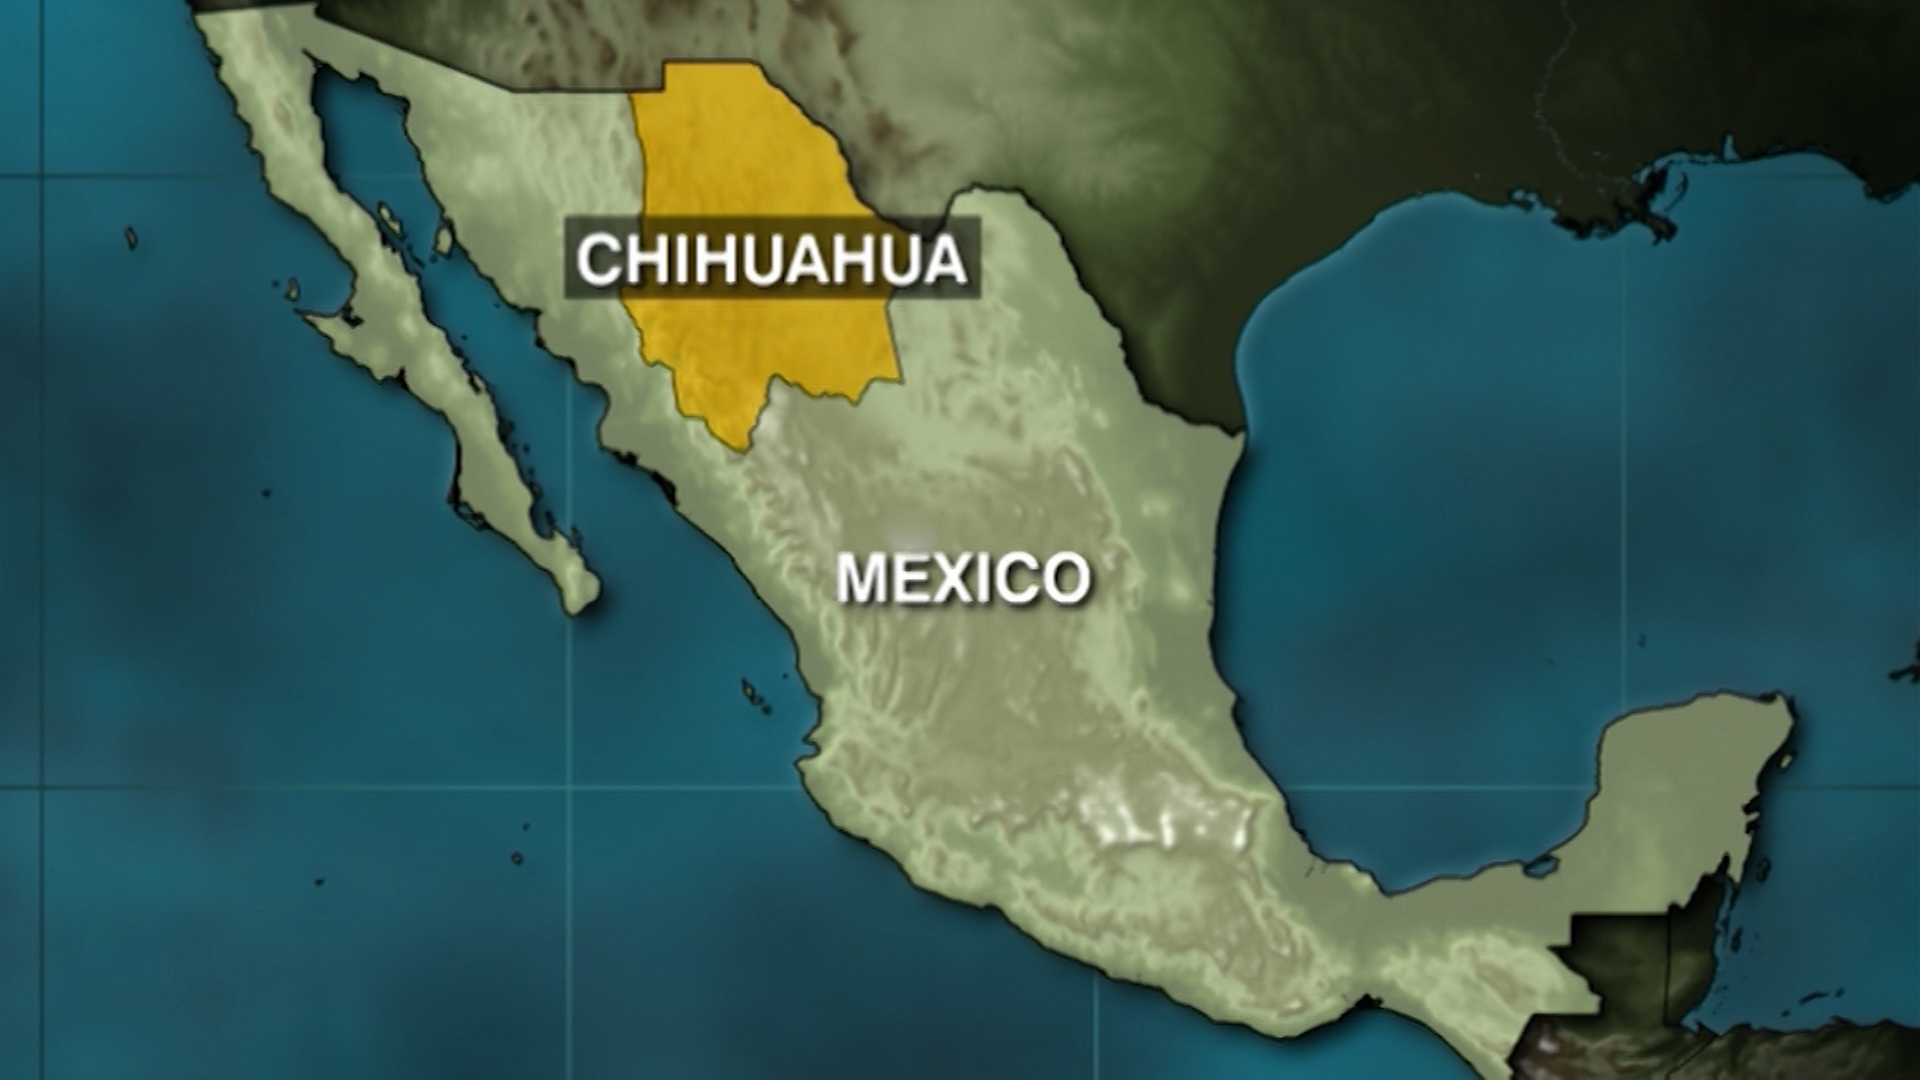 Chihuahua, Mexico / Graphic courtesy CNN